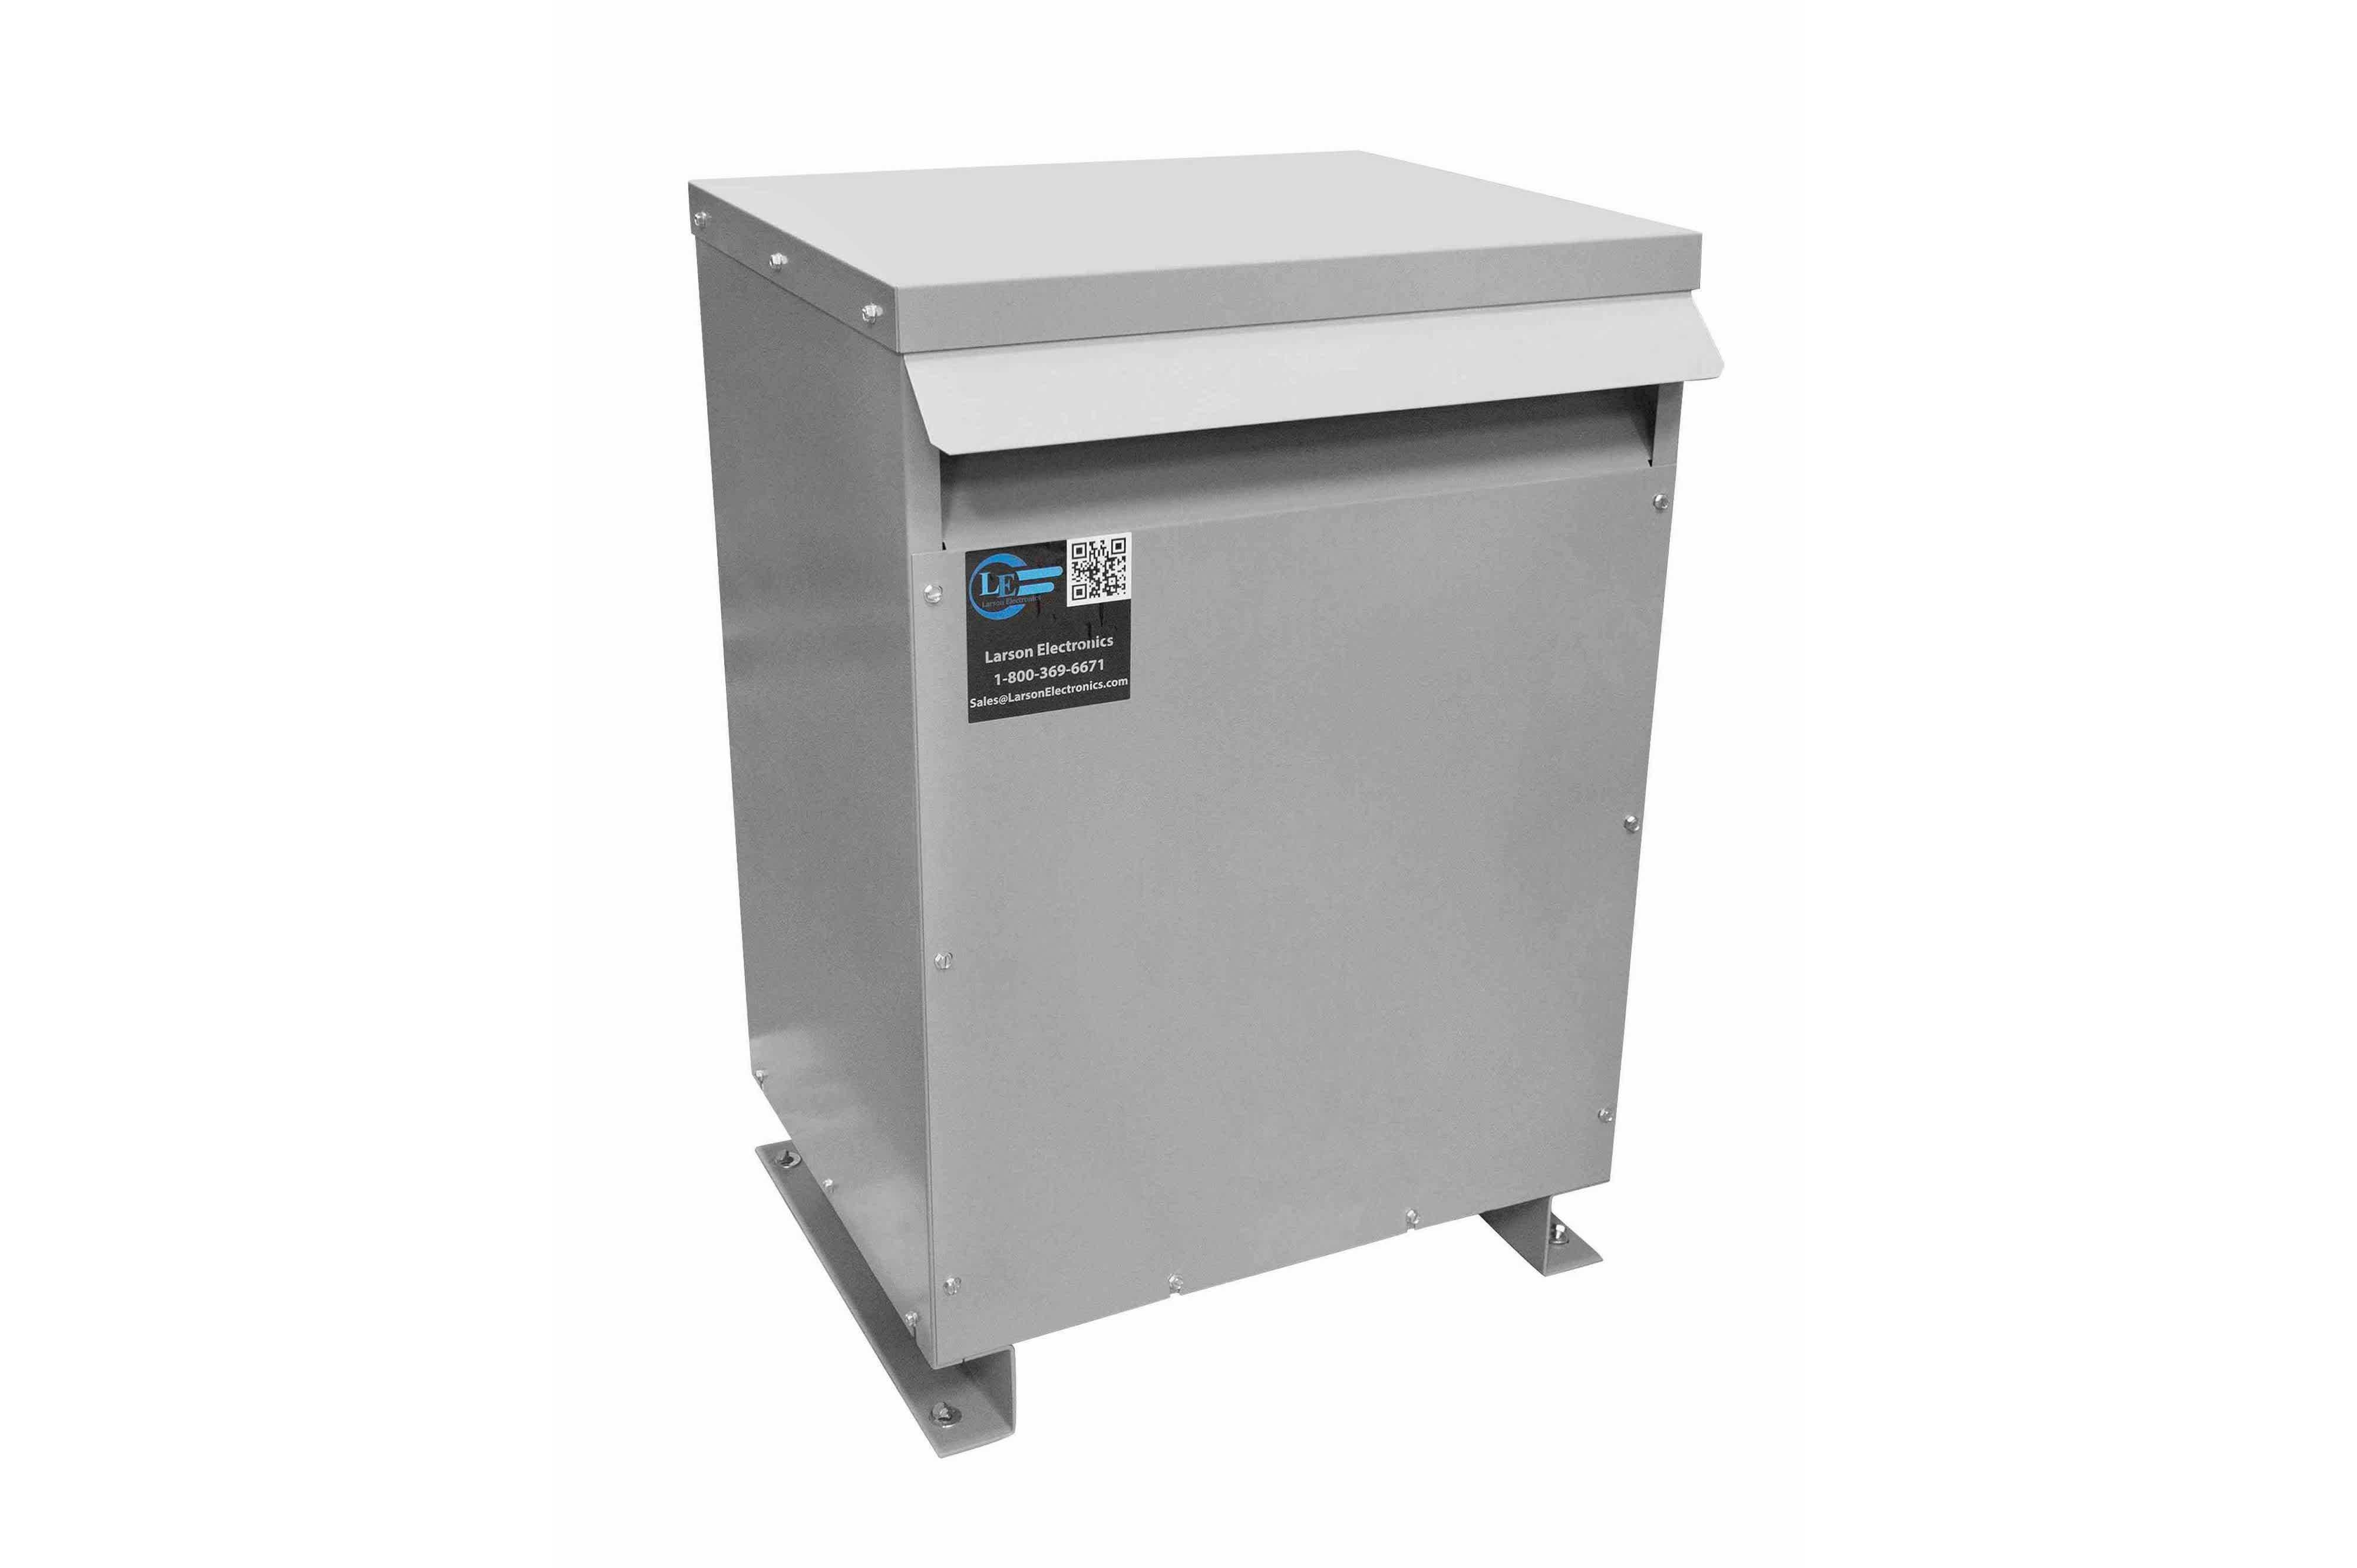 275 kVA 3PH Isolation Transformer, 380V Wye Primary, 600V Delta Secondary, N3R, Ventilated, 60 Hz